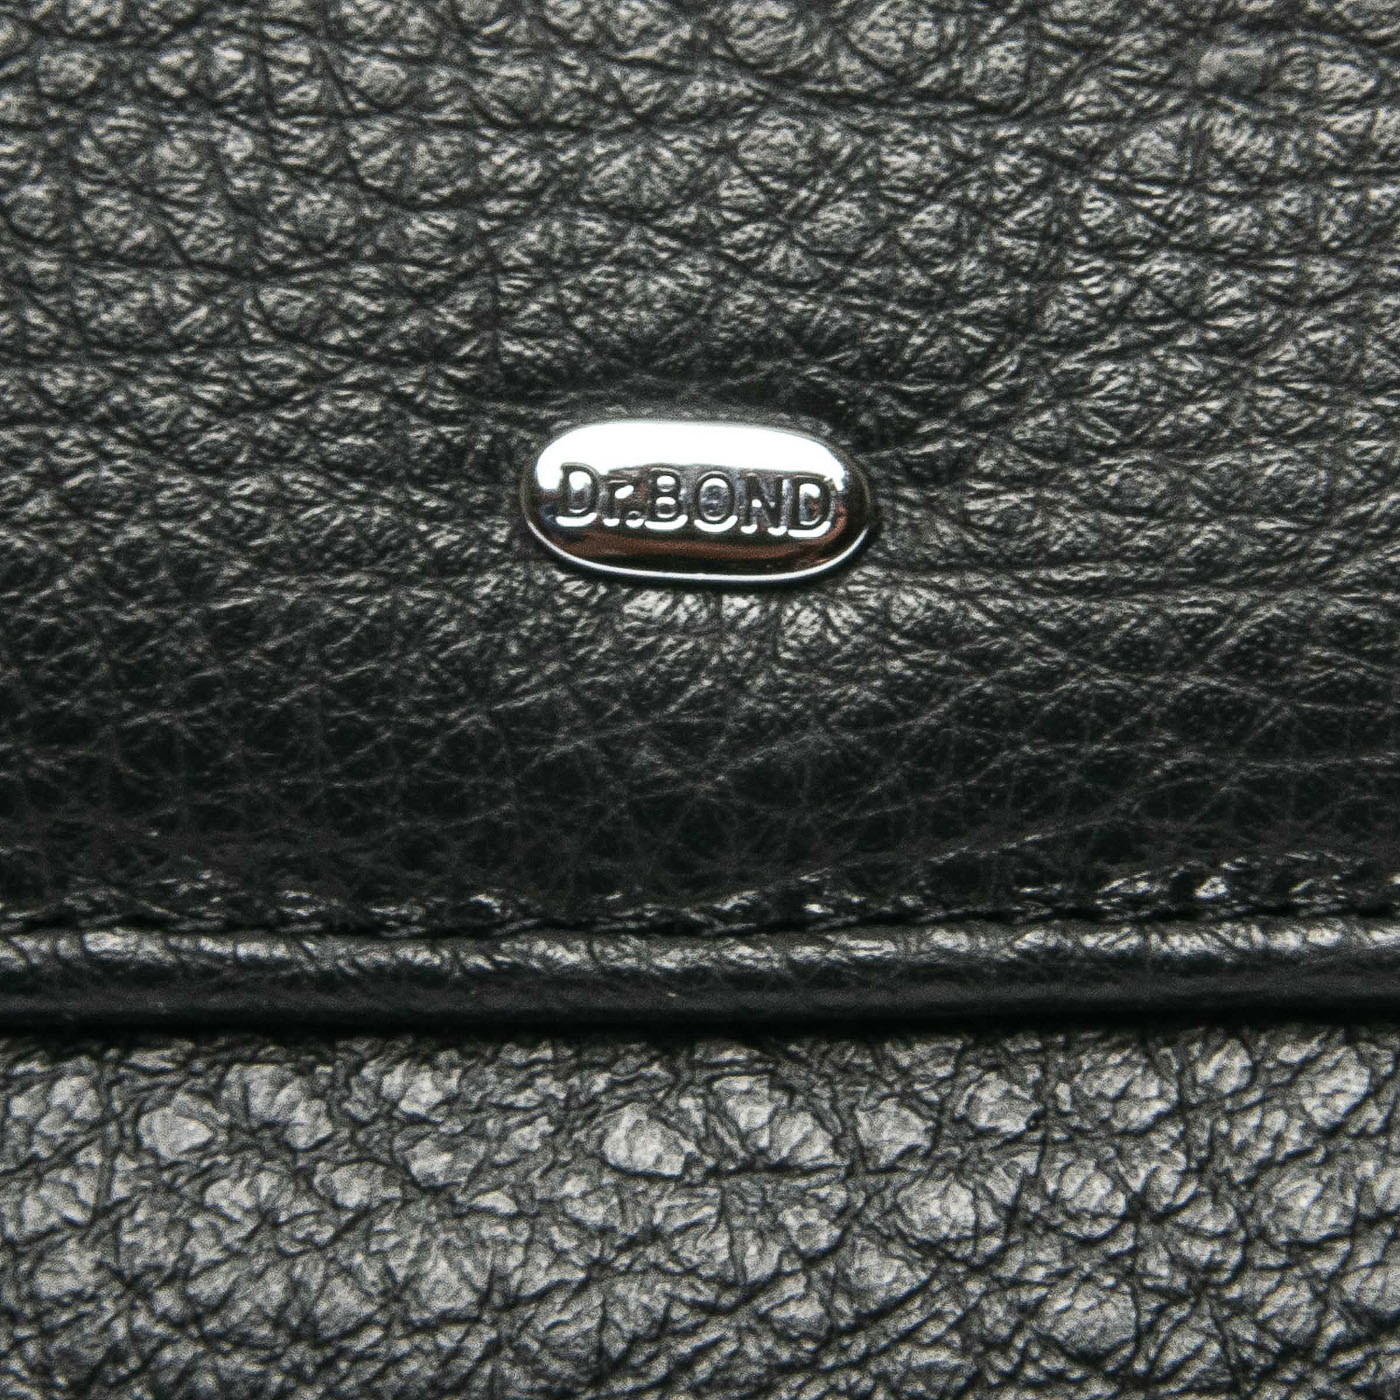 Кошелек Classic кожа DR. BOND WMB-4M black color - фото 3